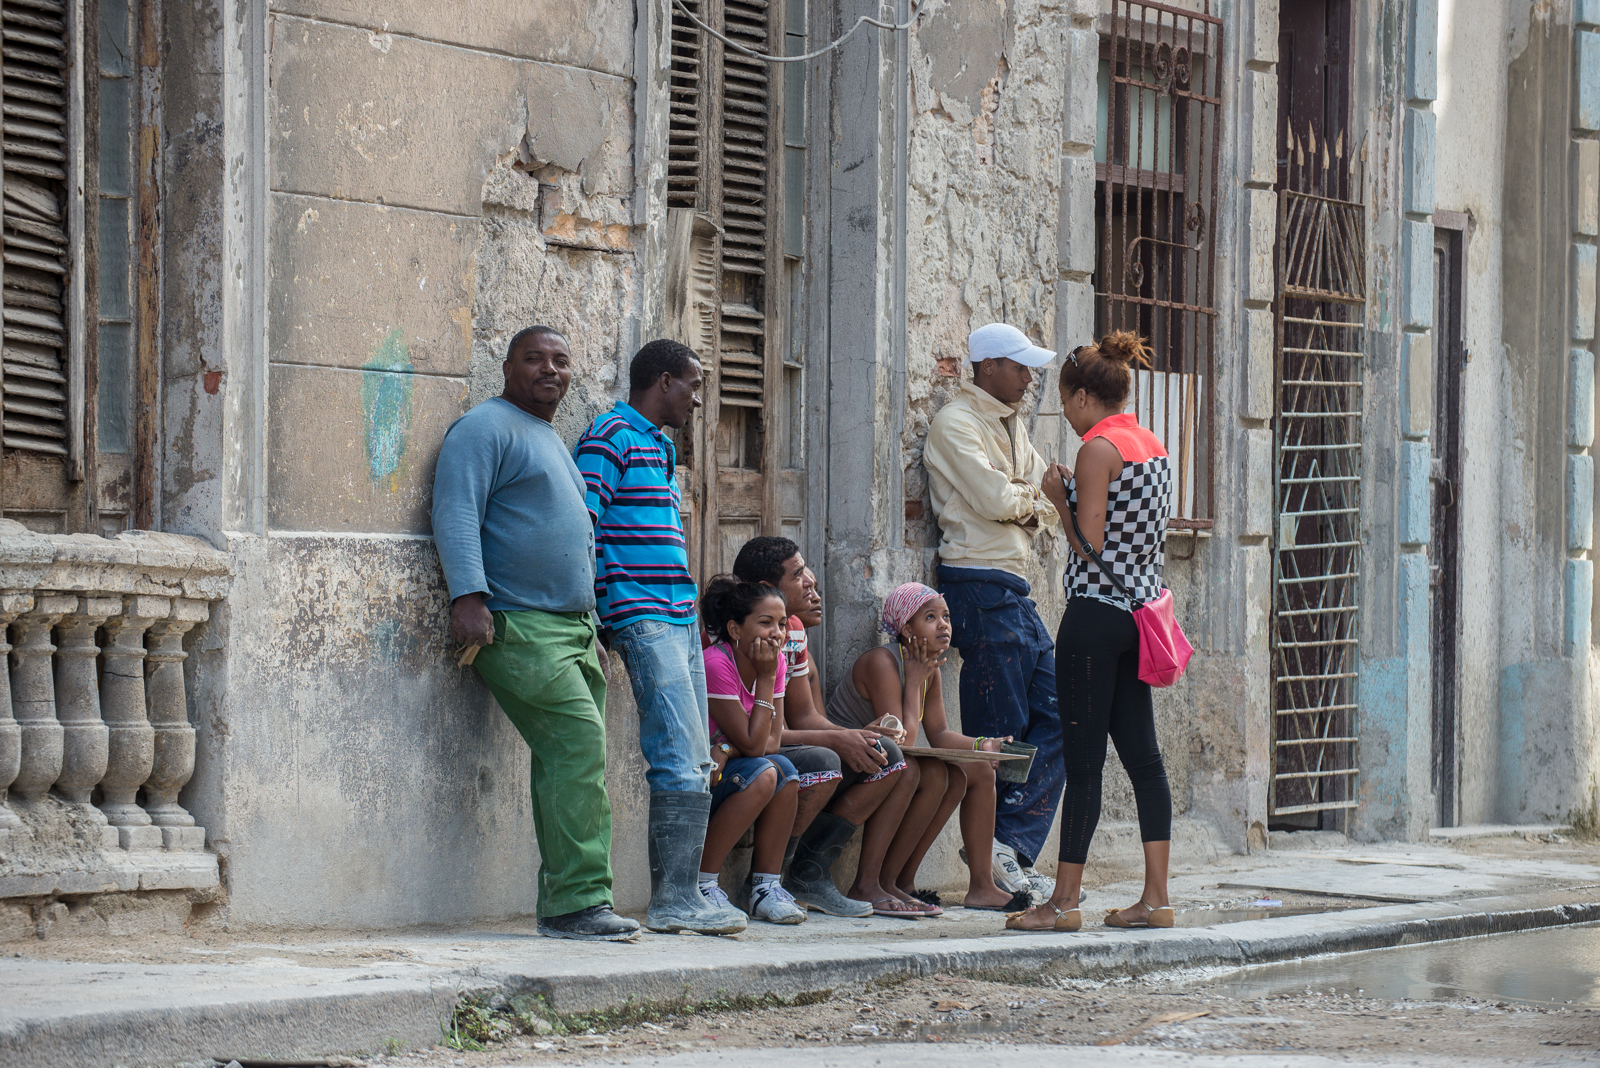 People in Havana streets